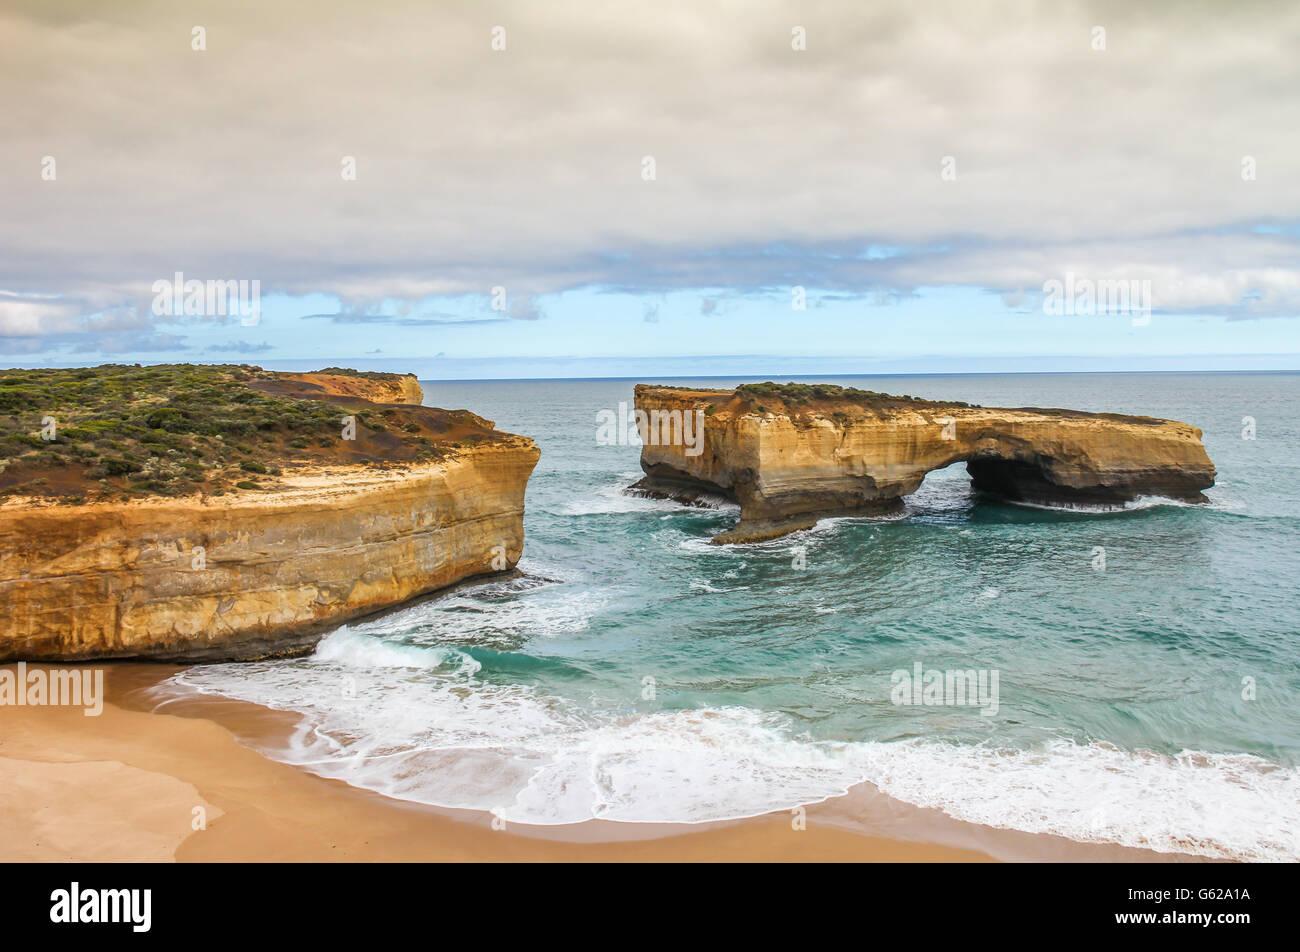 Twelve apostle beach Australi - Stock Image